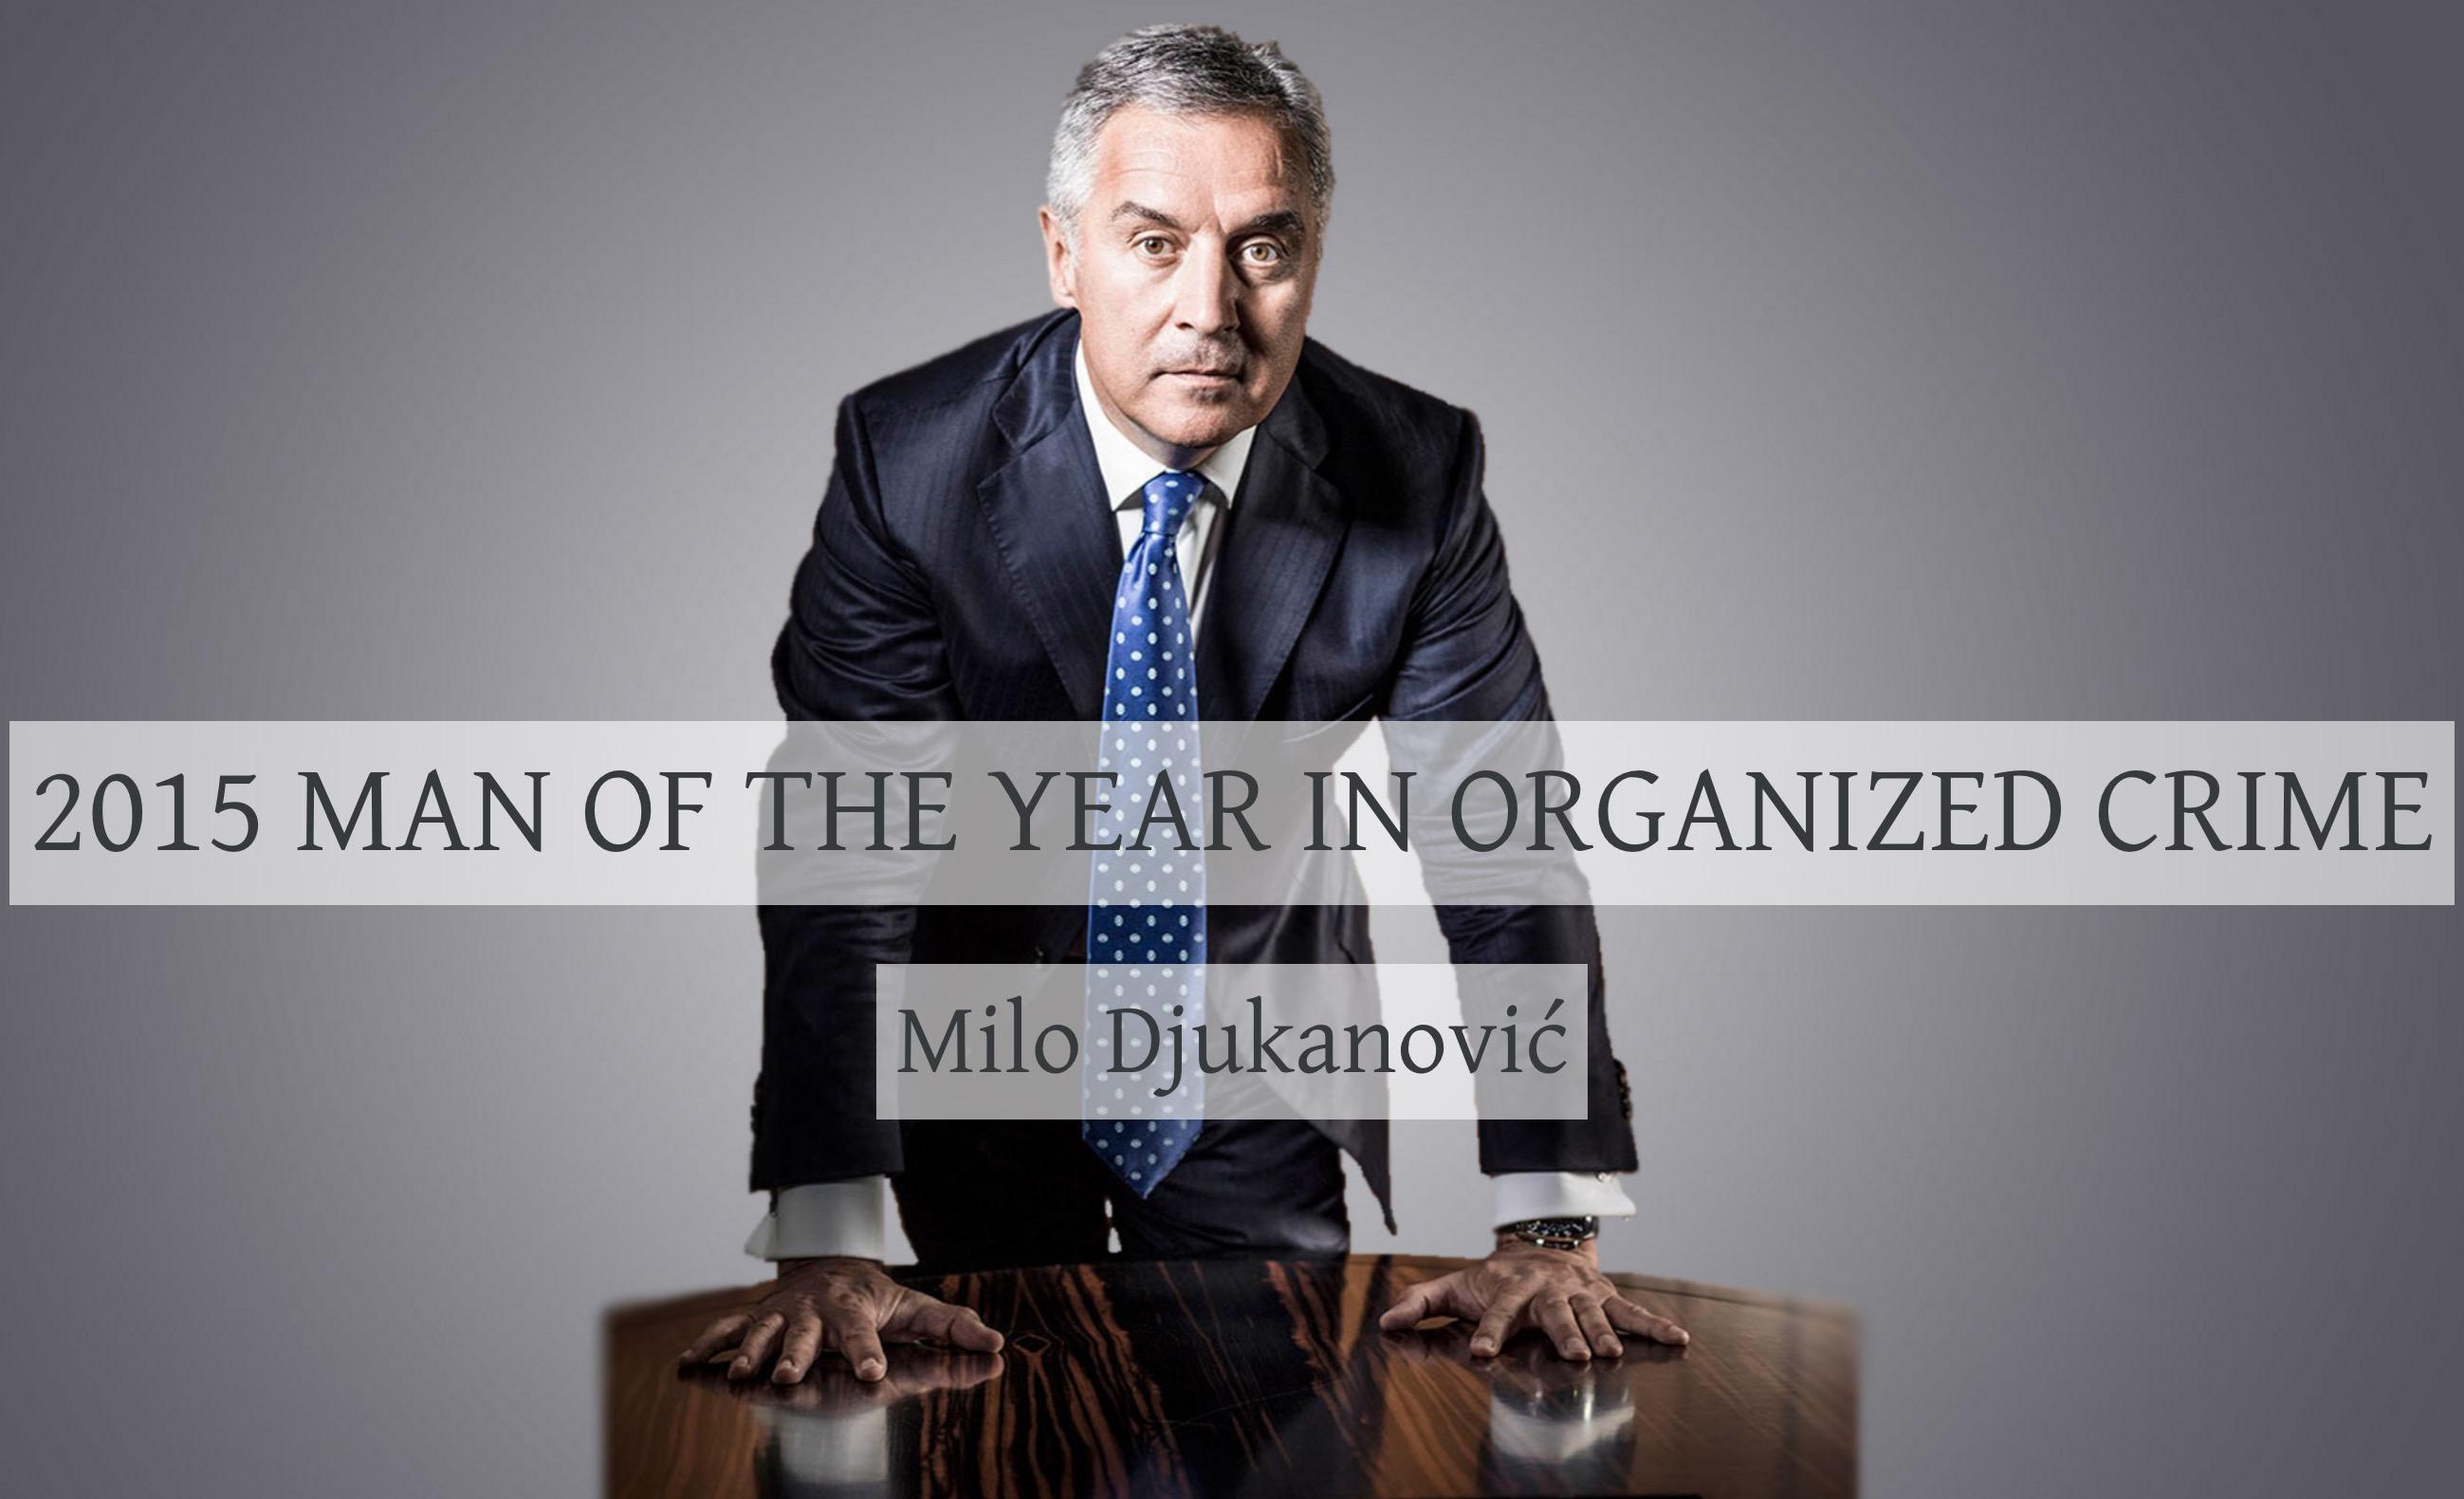 djukanovic-2015